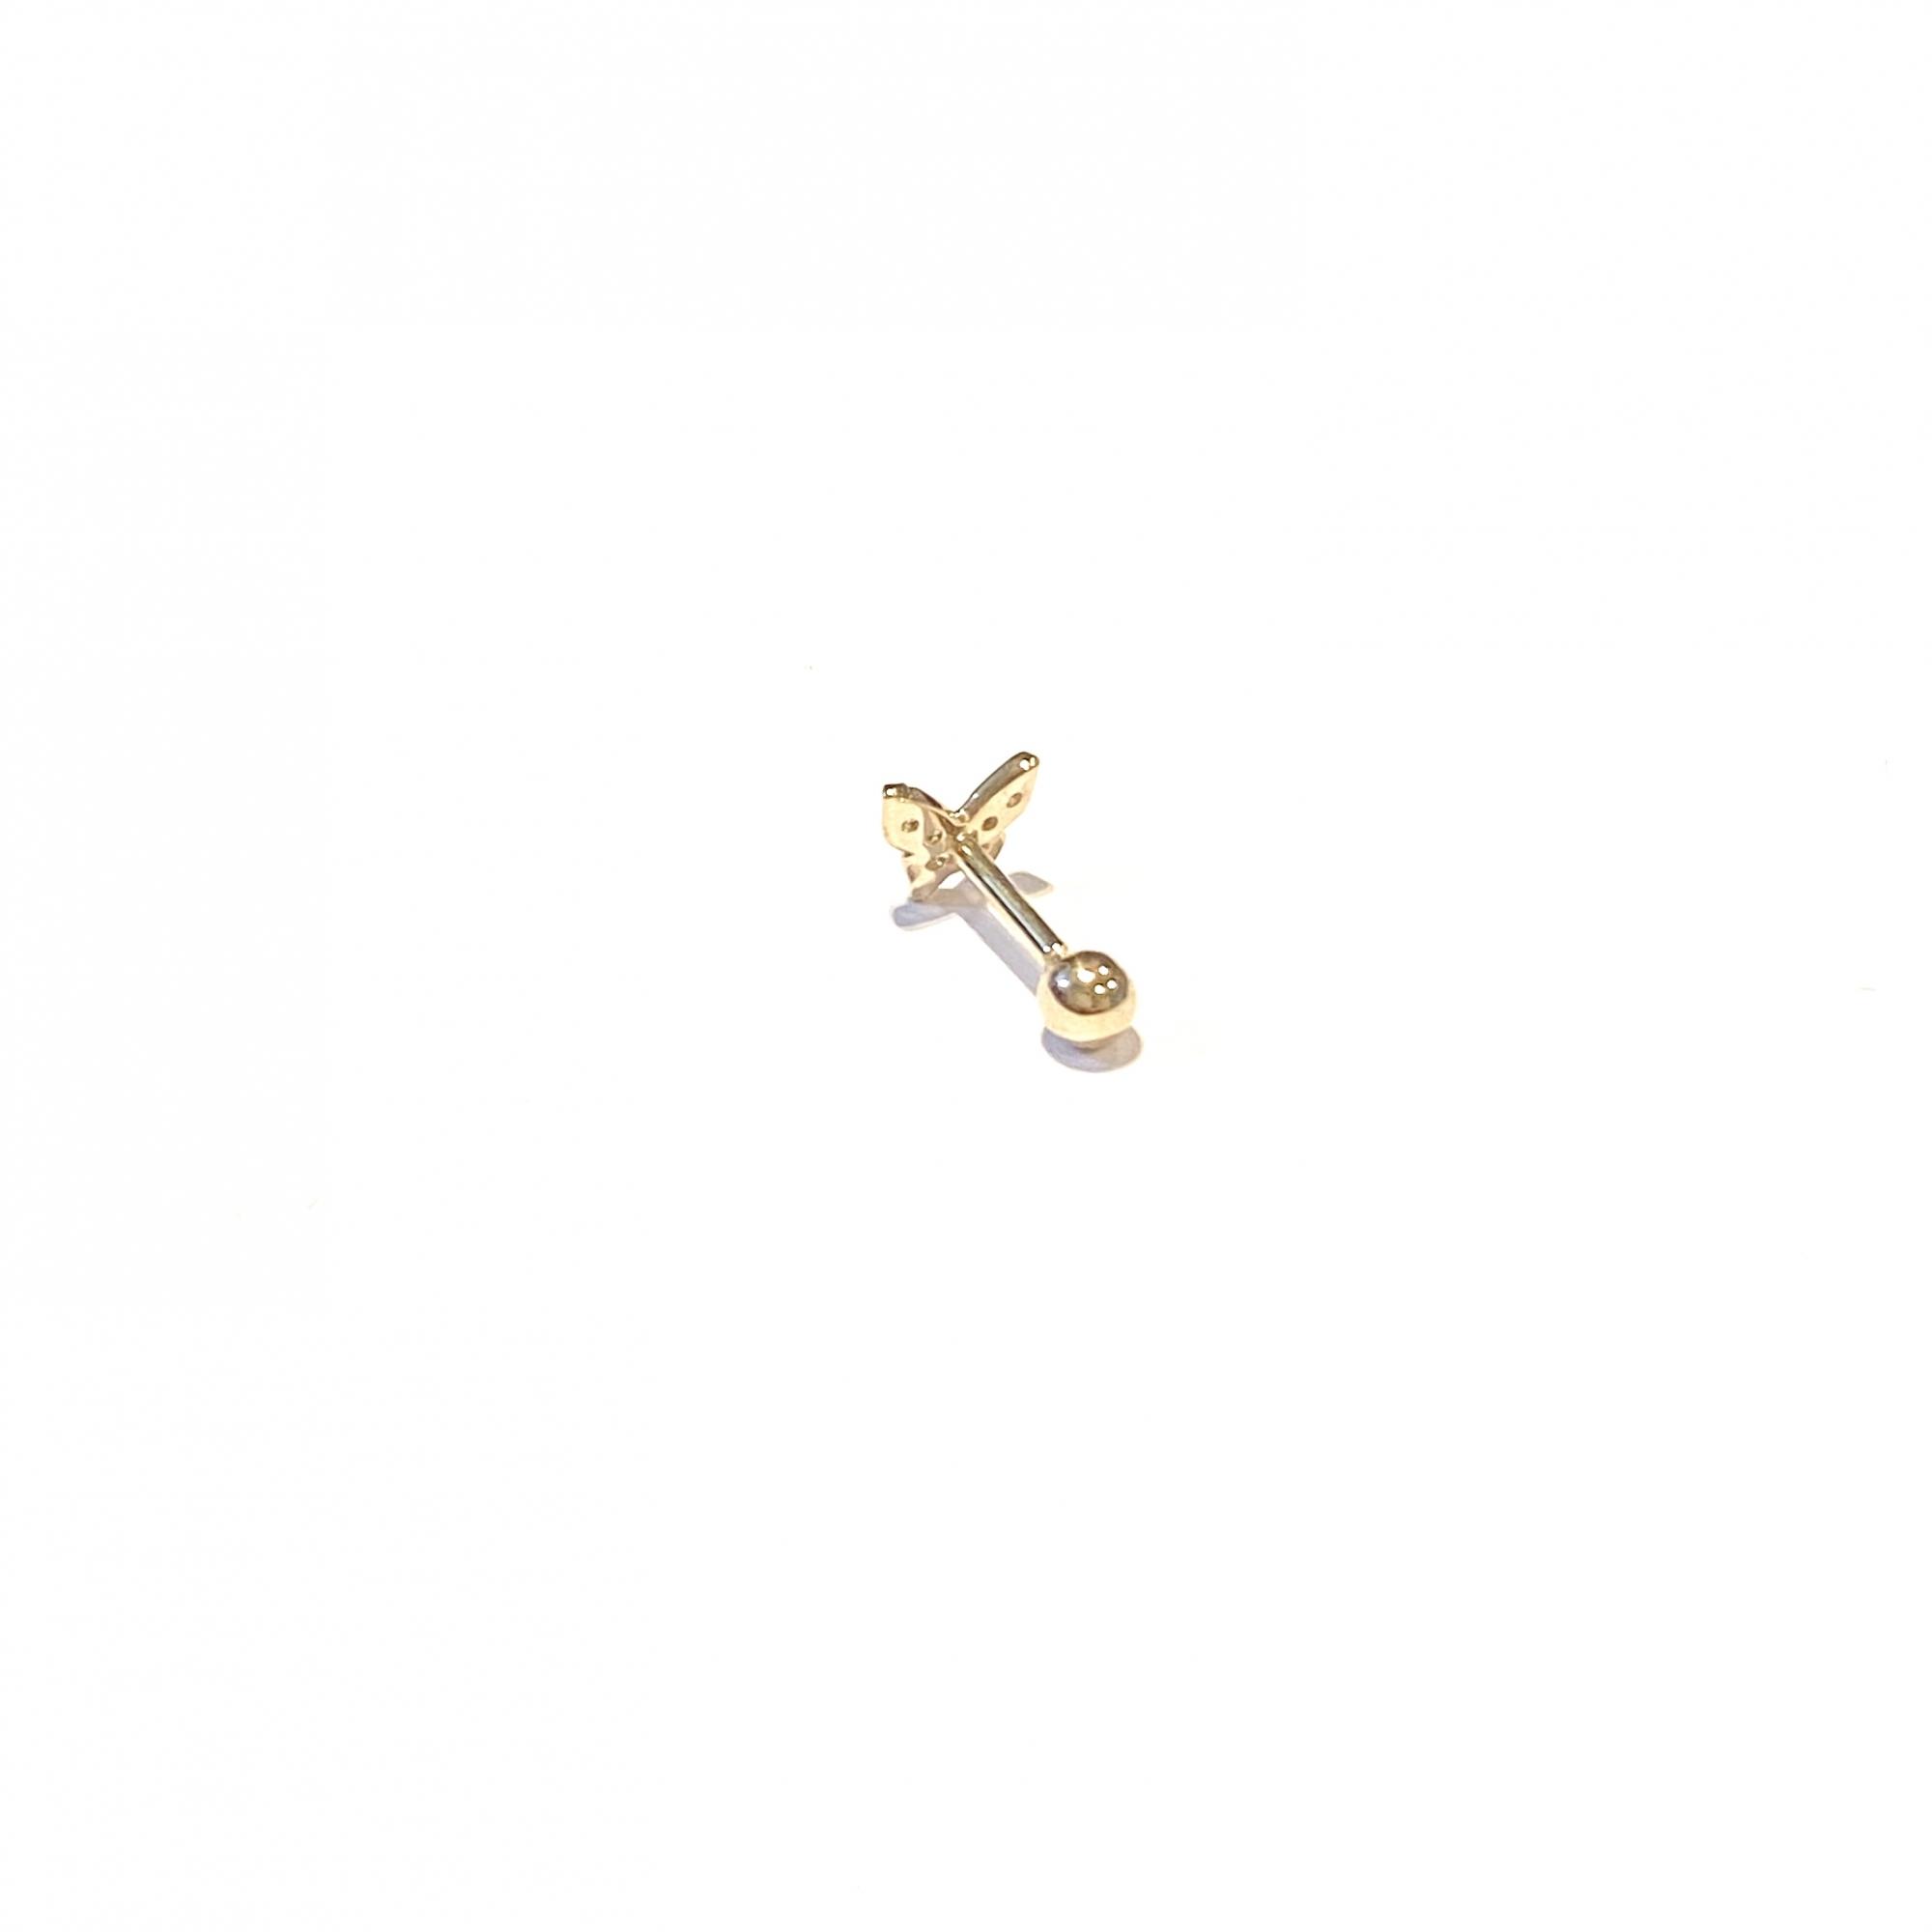 Piercing Ouro 18k Borboleta Com Pedra Branca Brinco Bk070